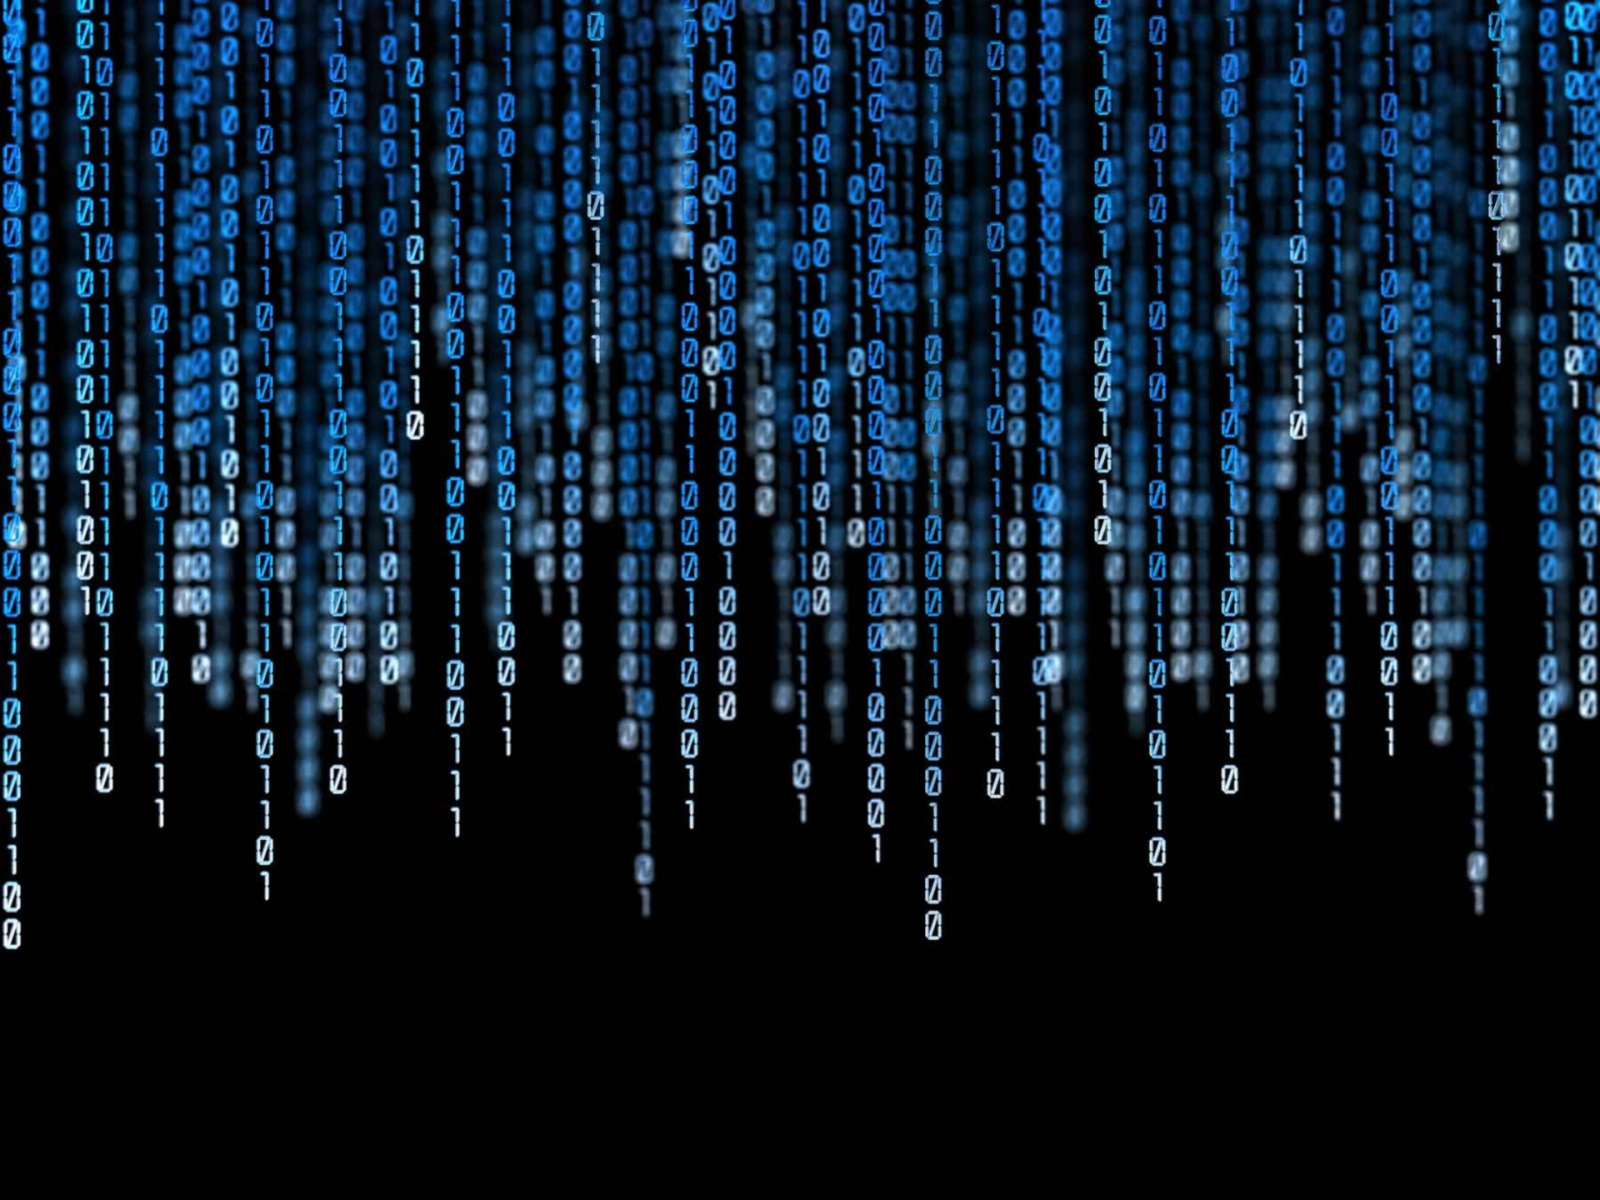 blue_binary_code_1600_1200